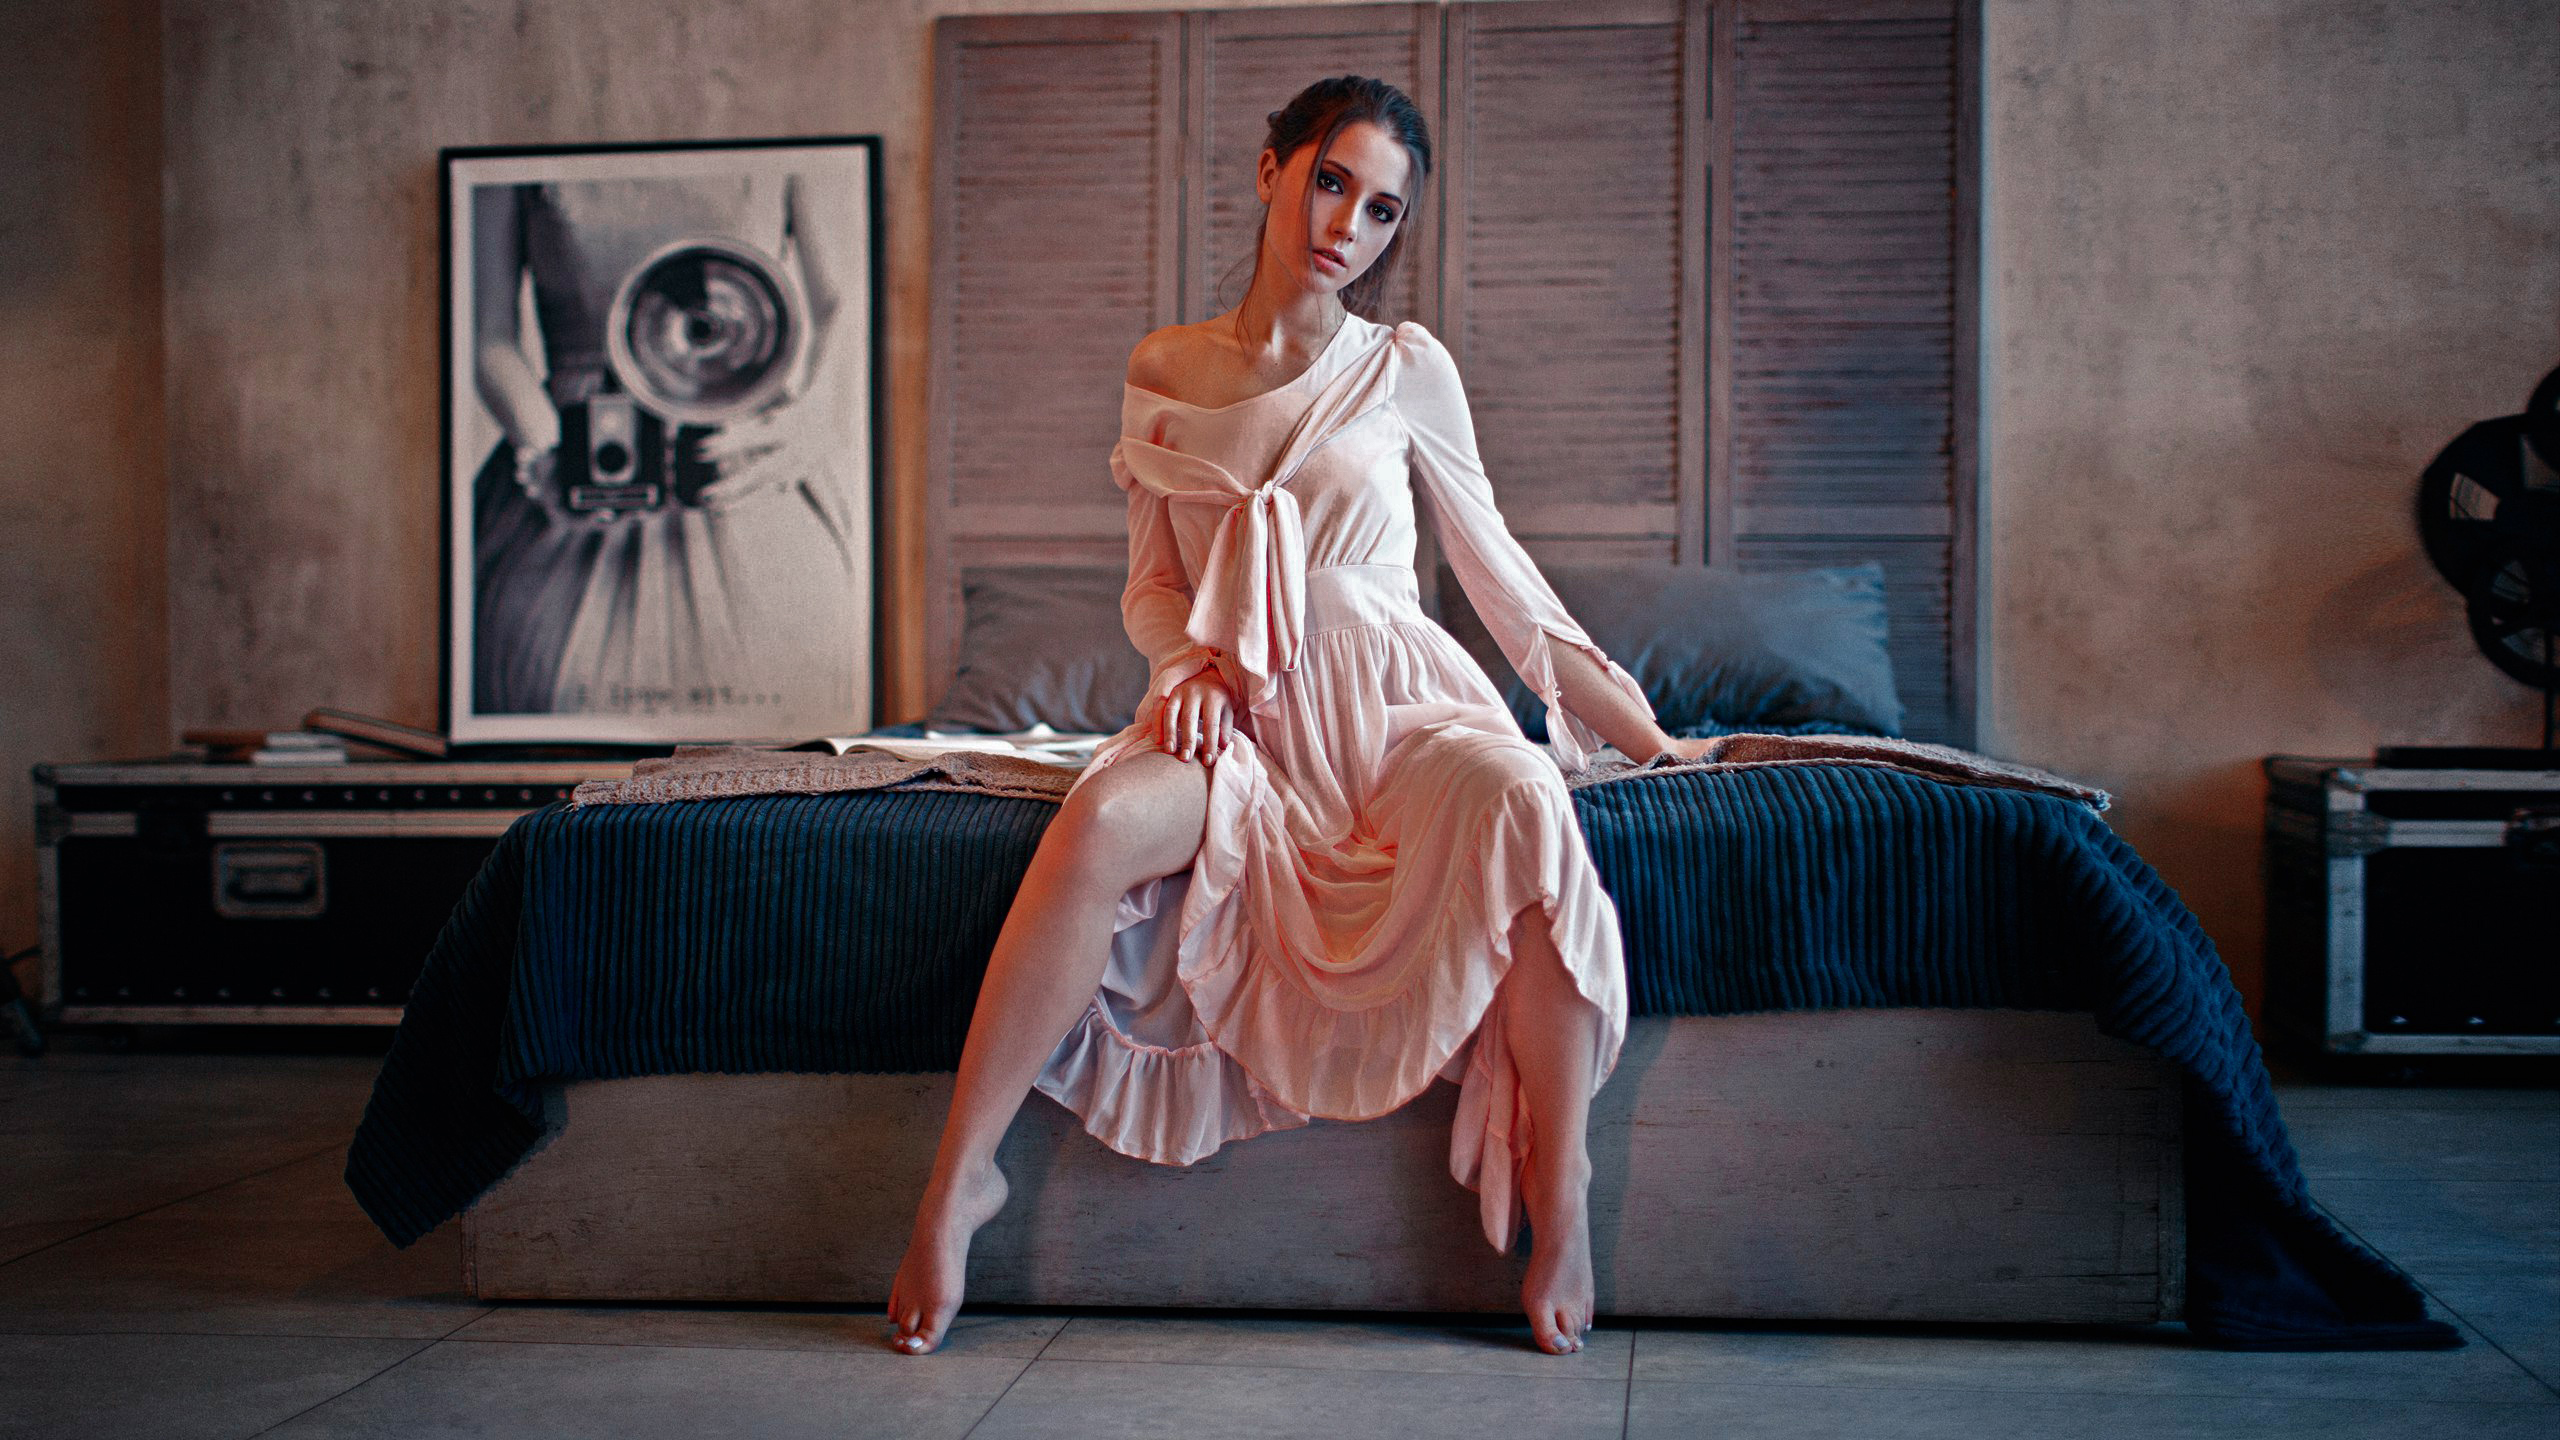 Ksenia Kokoreva Alexey Kishechkin Women Brunette Pink Dress Bed Looking At Viewer Indoors Barefoot S 2560x1440